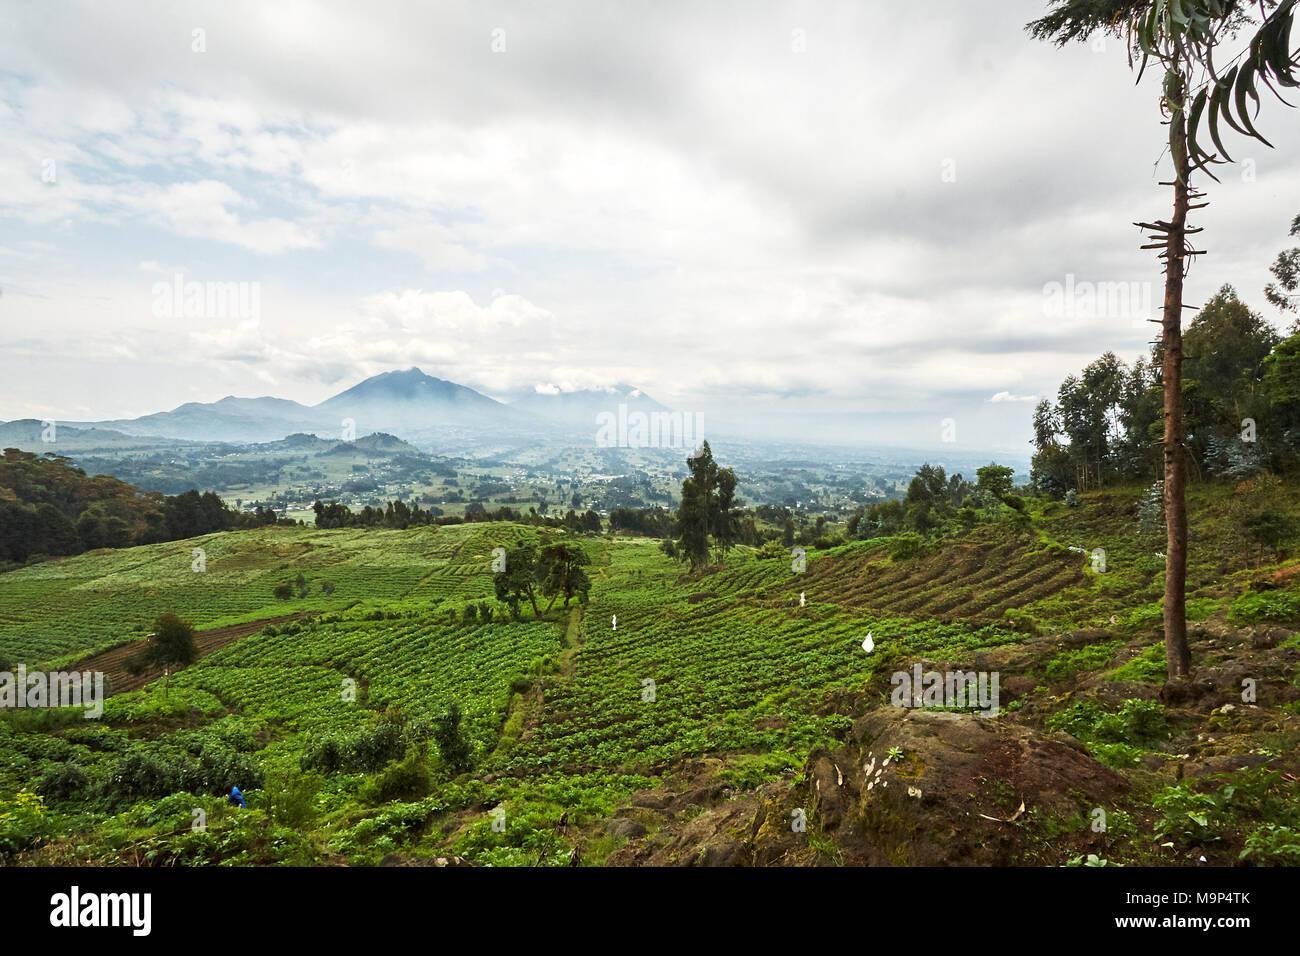 Green Landscape view in Virunga reserve, Rwanda - Stock Image